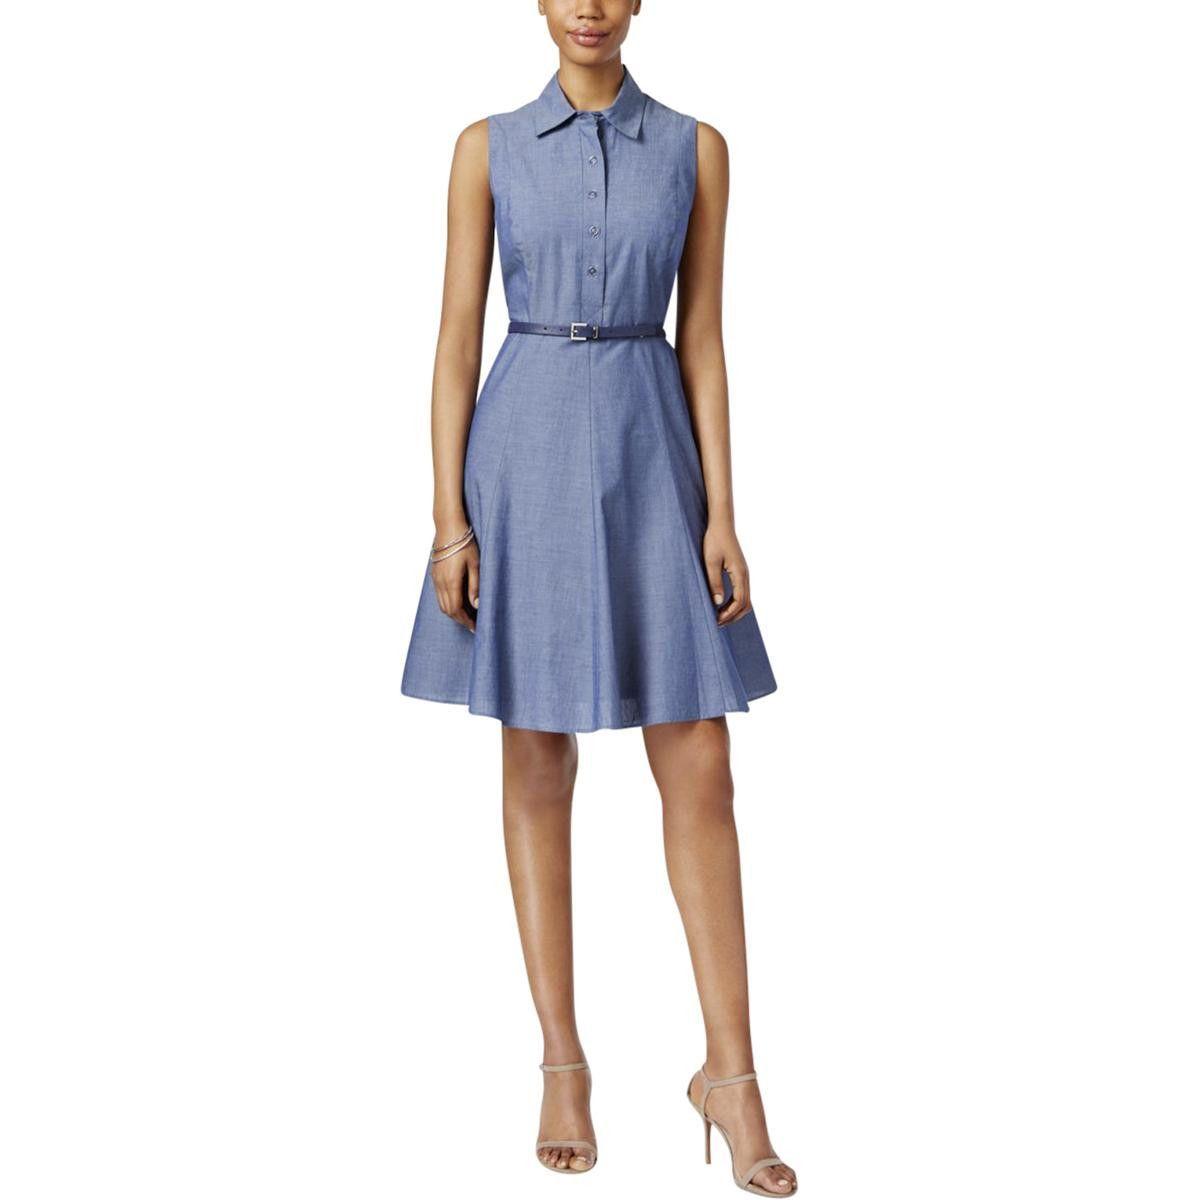 Nine West Womens Chambray Sleeveless Shirtdress Products